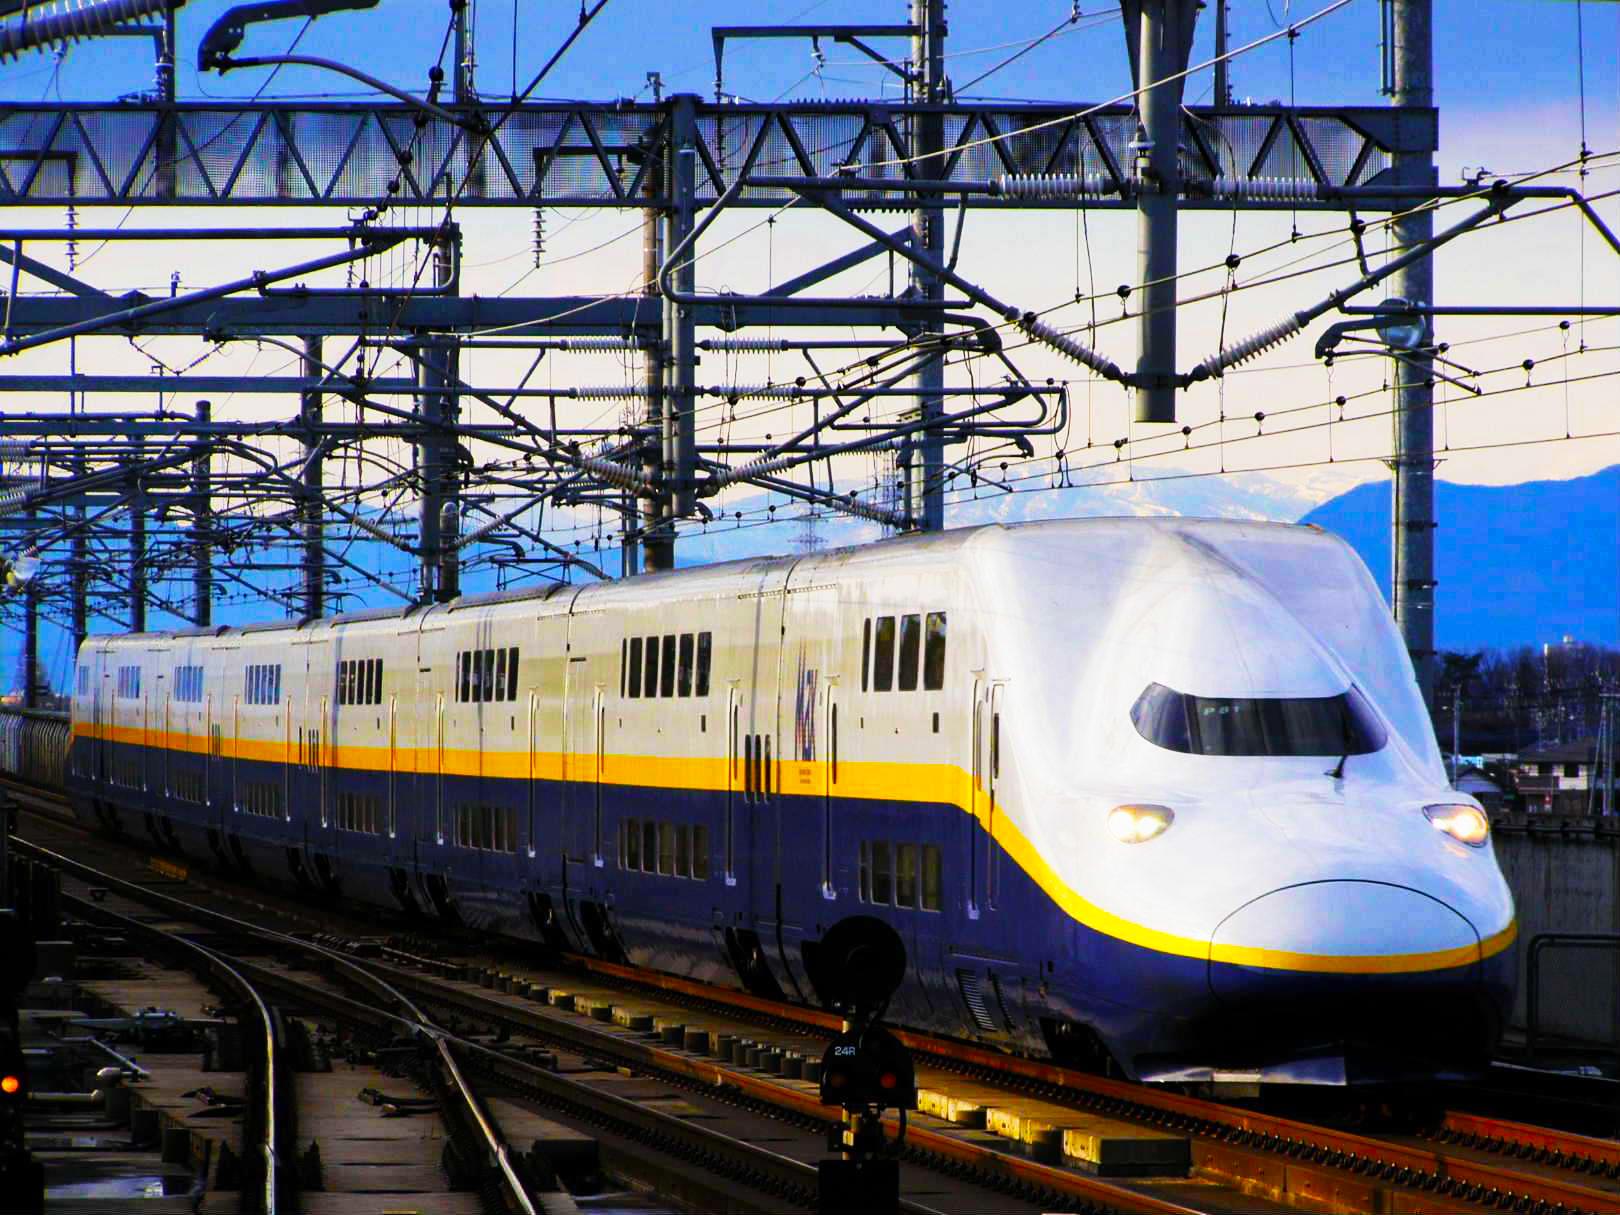 Beli Tiket Shinkansen Online Dimana?? image